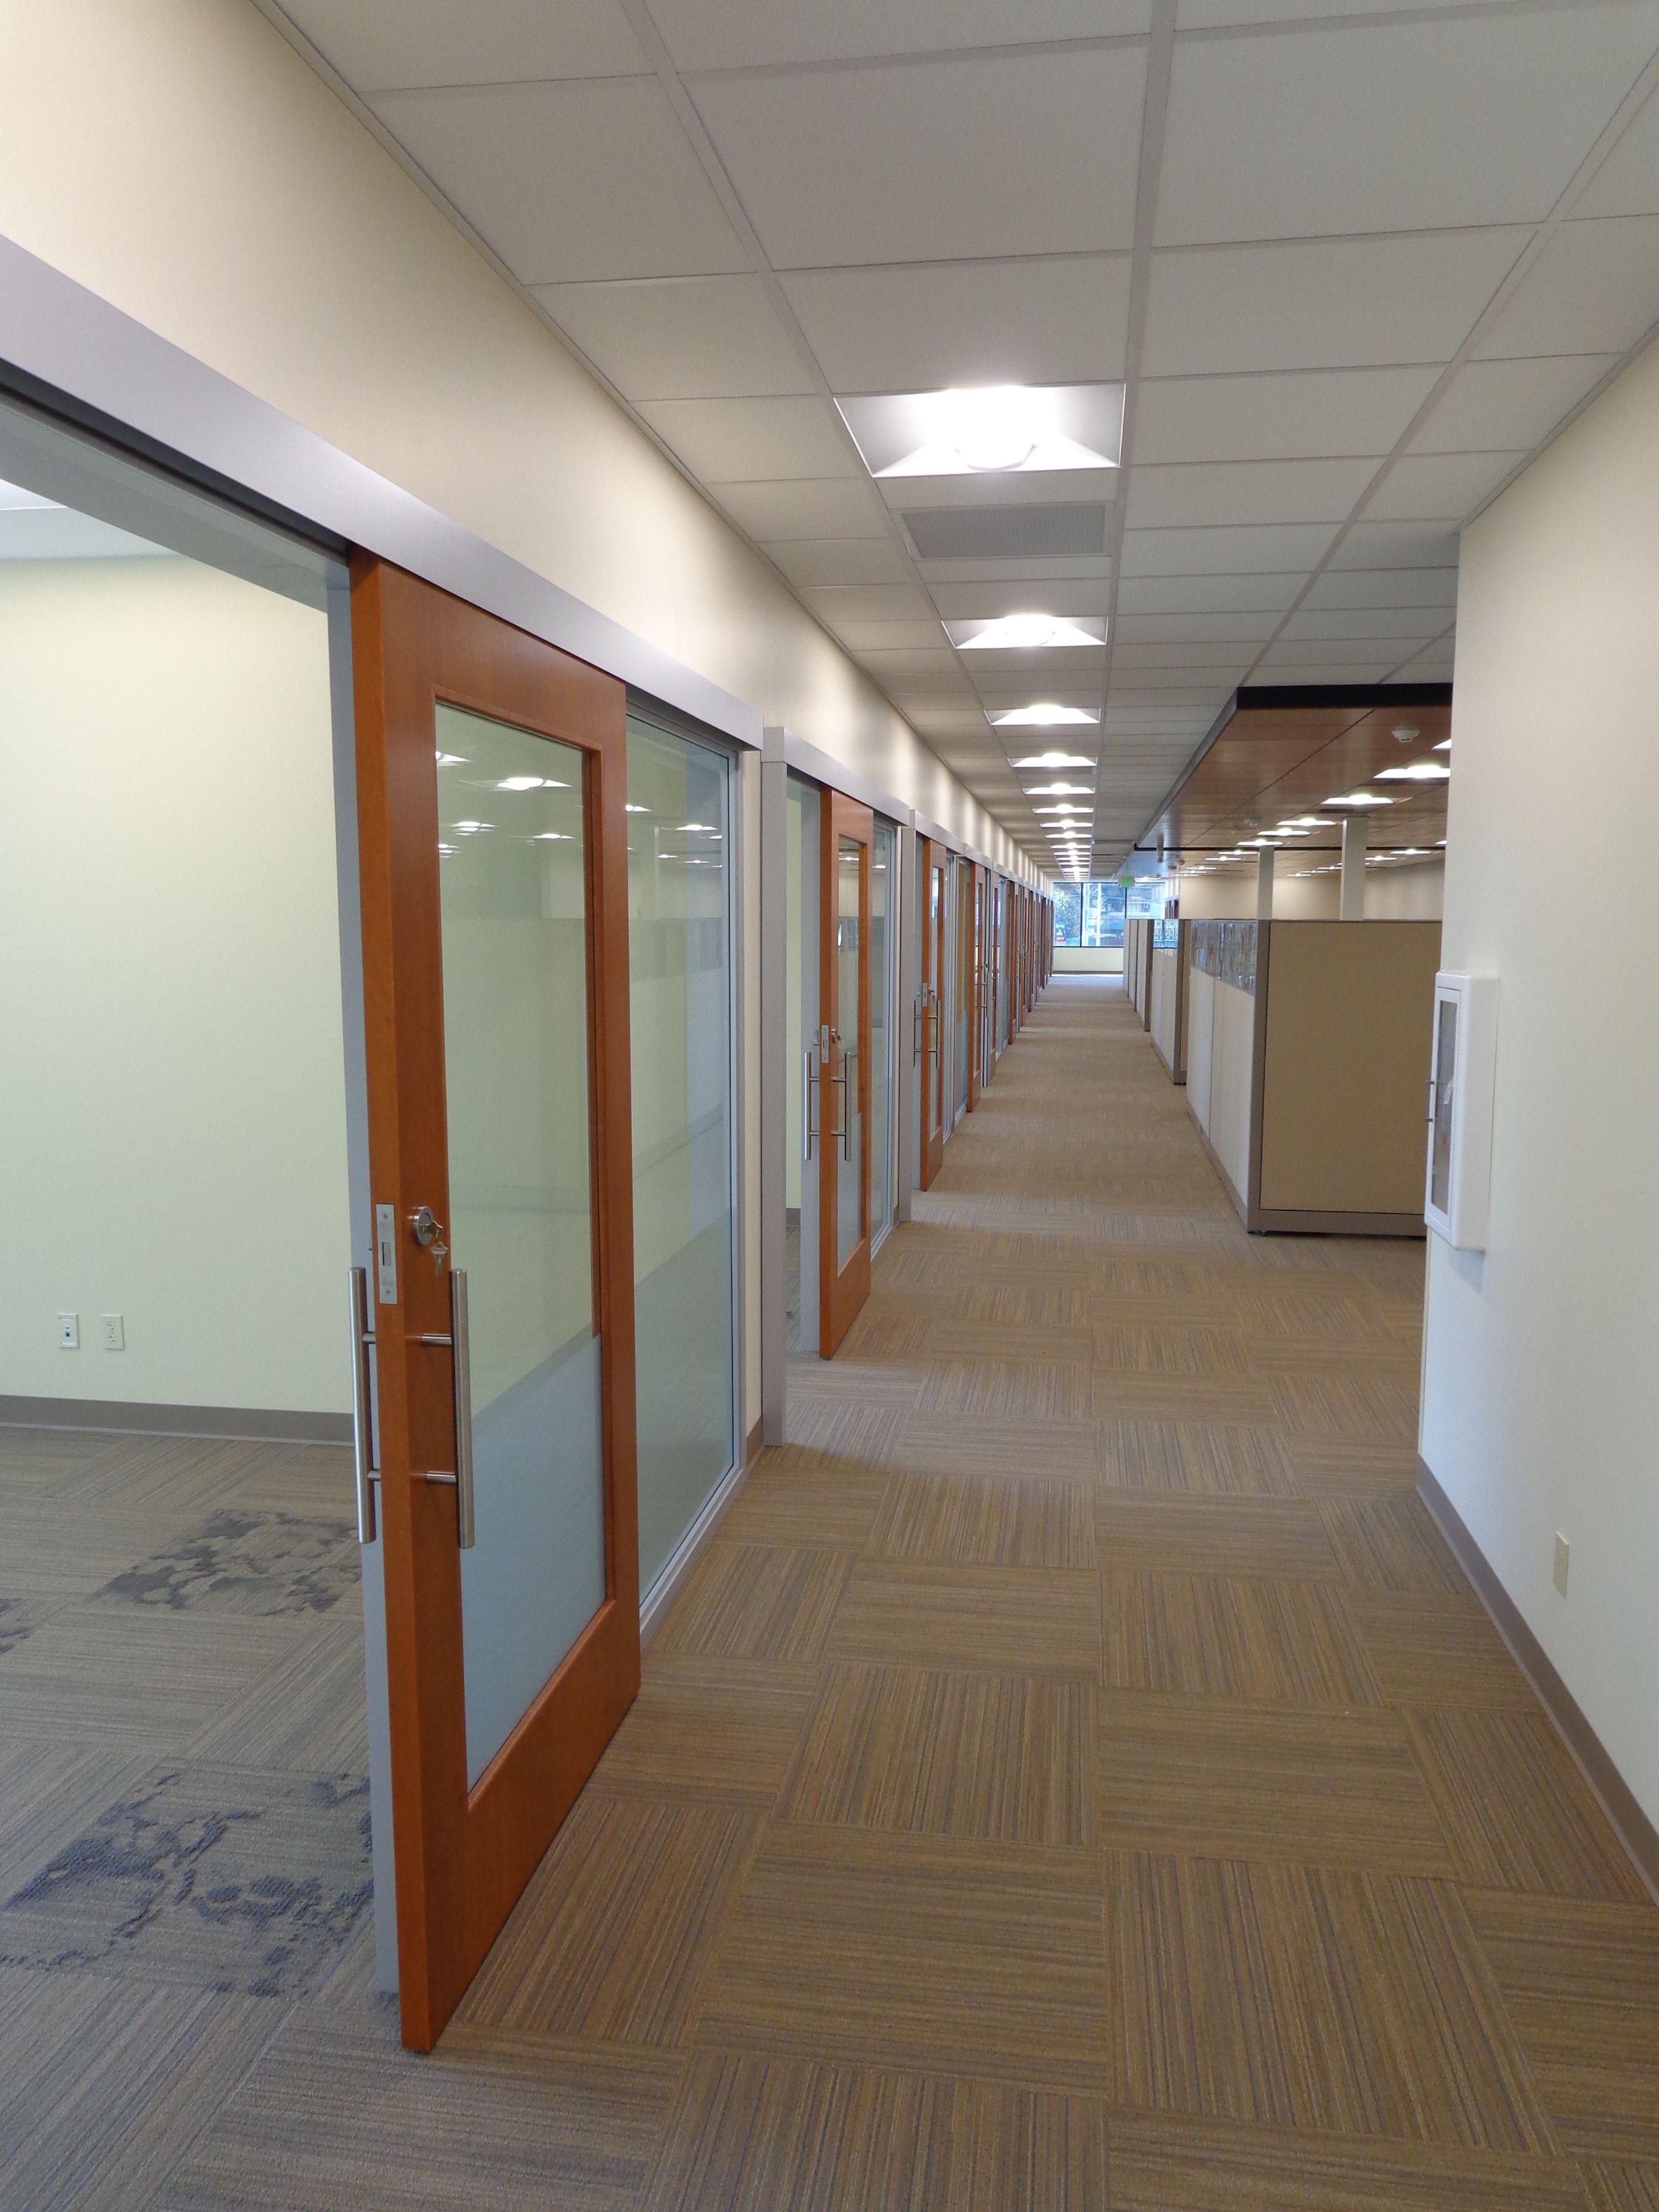 Carpet everett wa floor matttroy for Hardwood floors everett wa